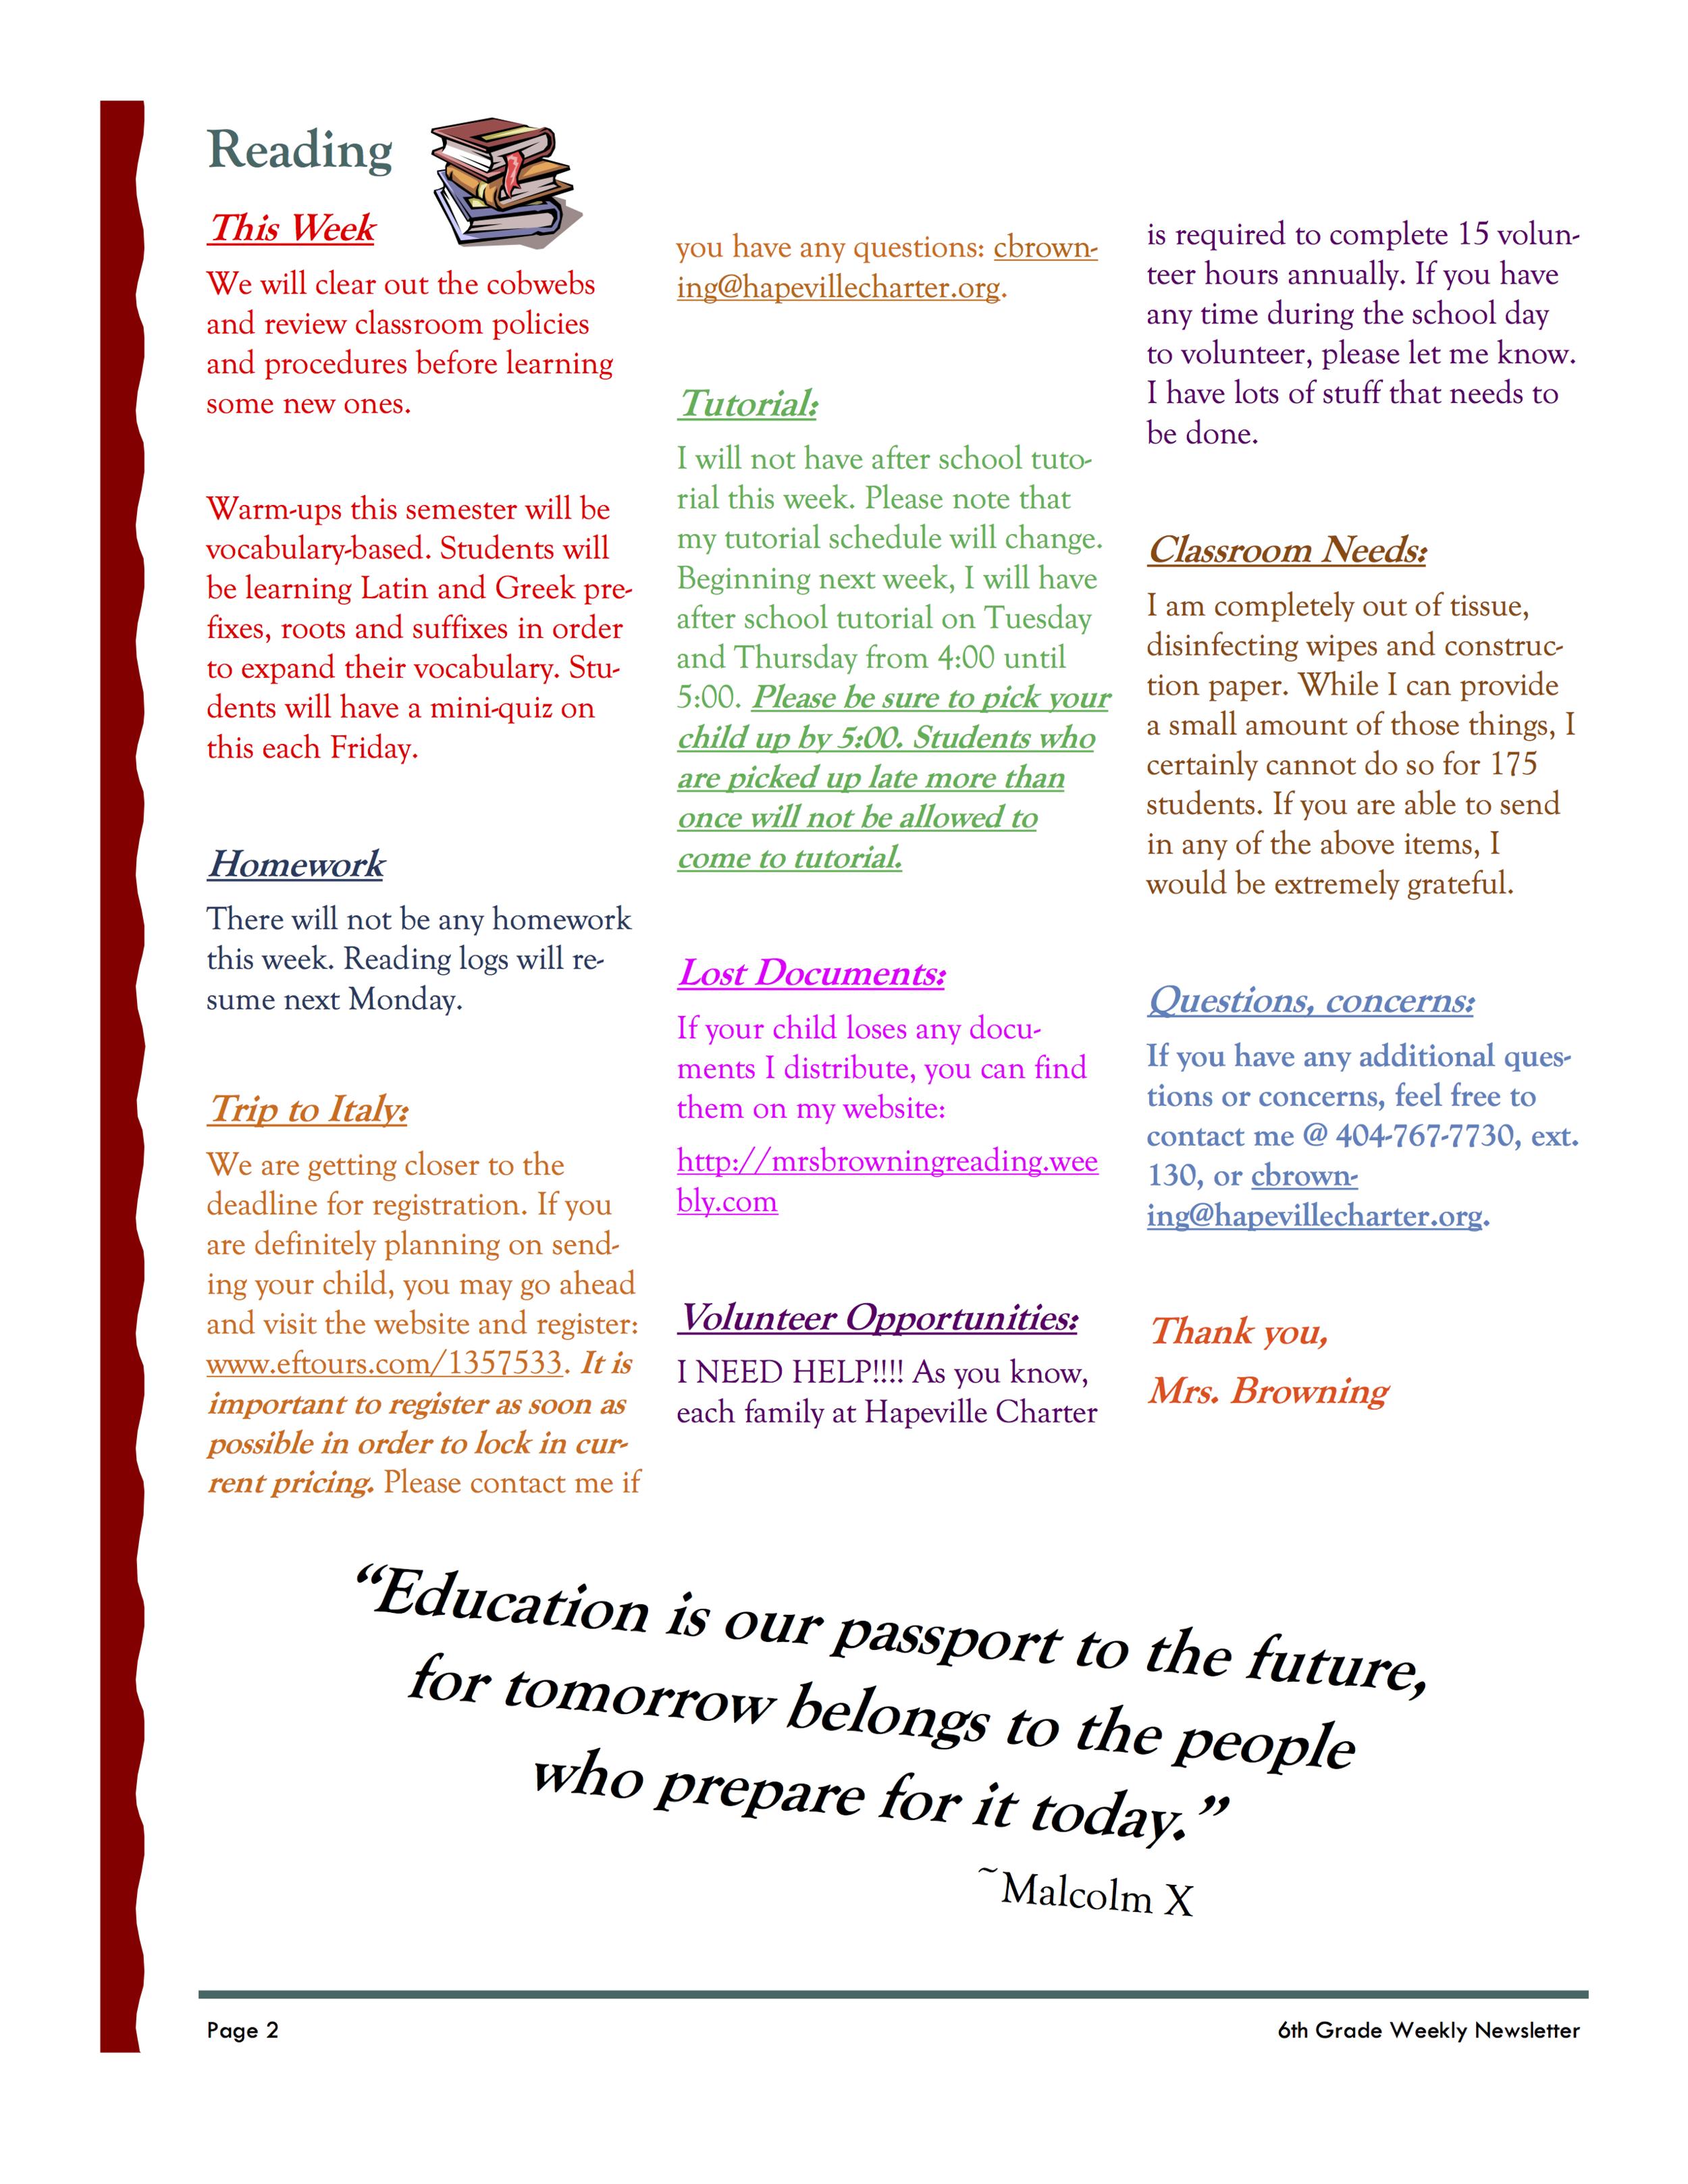 6th Grade Newsletter 1-7B.png